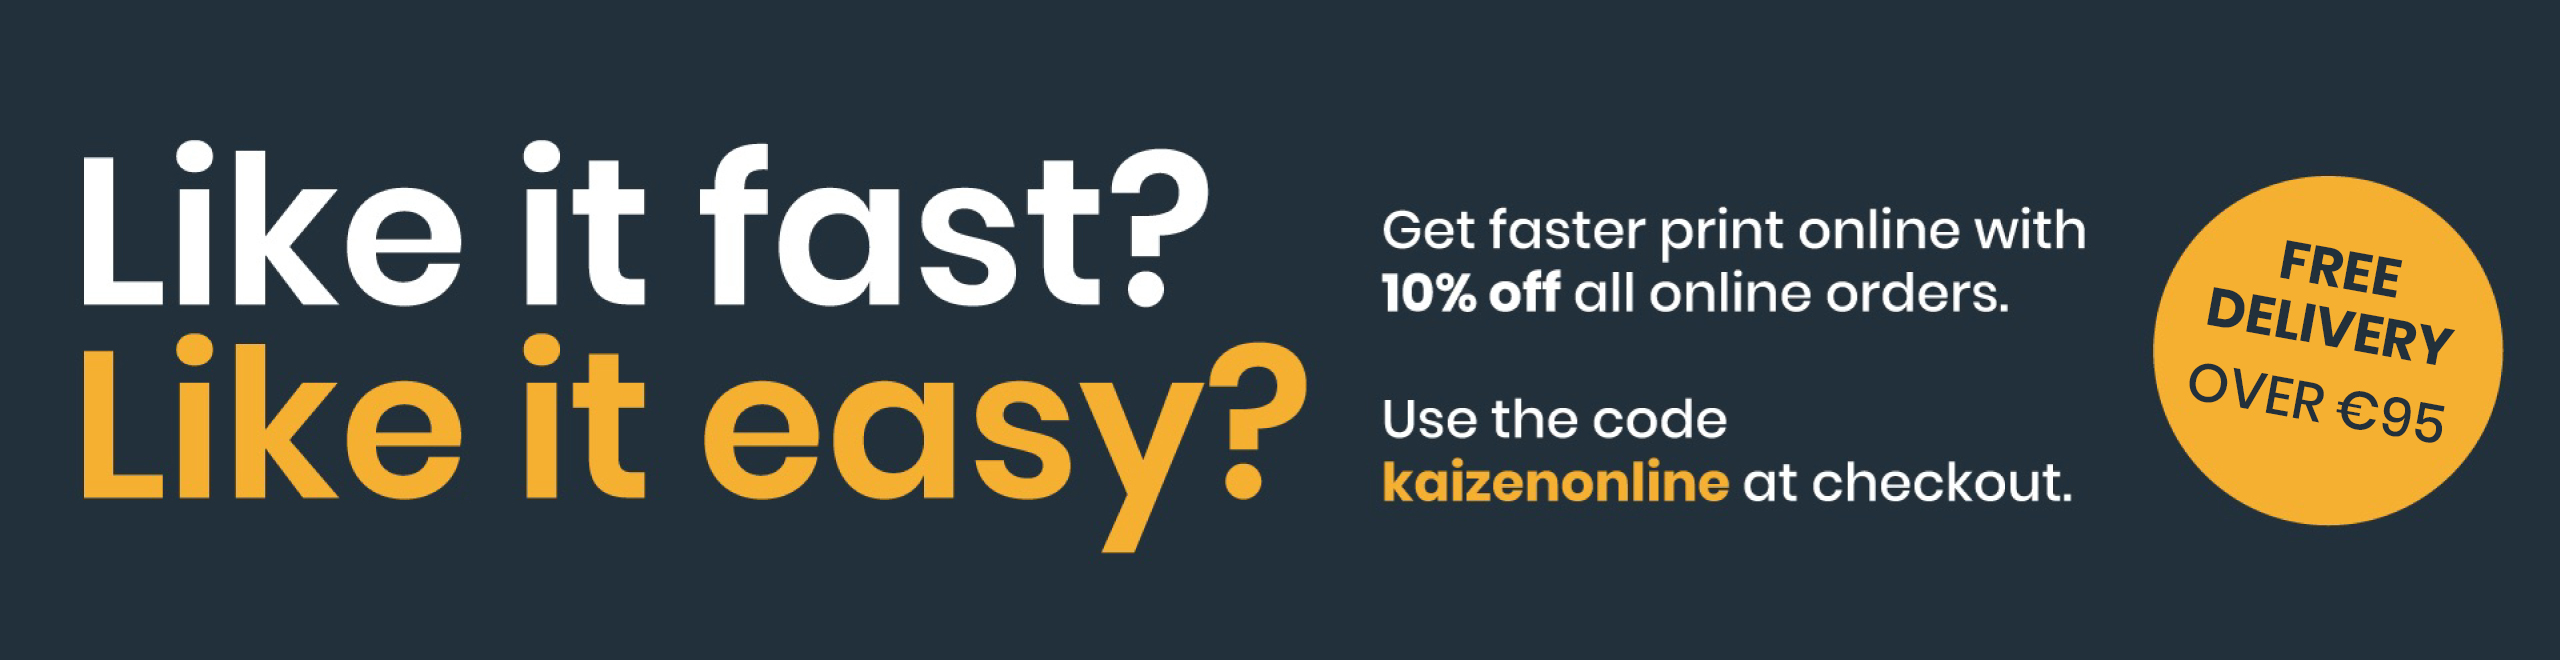 Kaizen Print New Site Launch